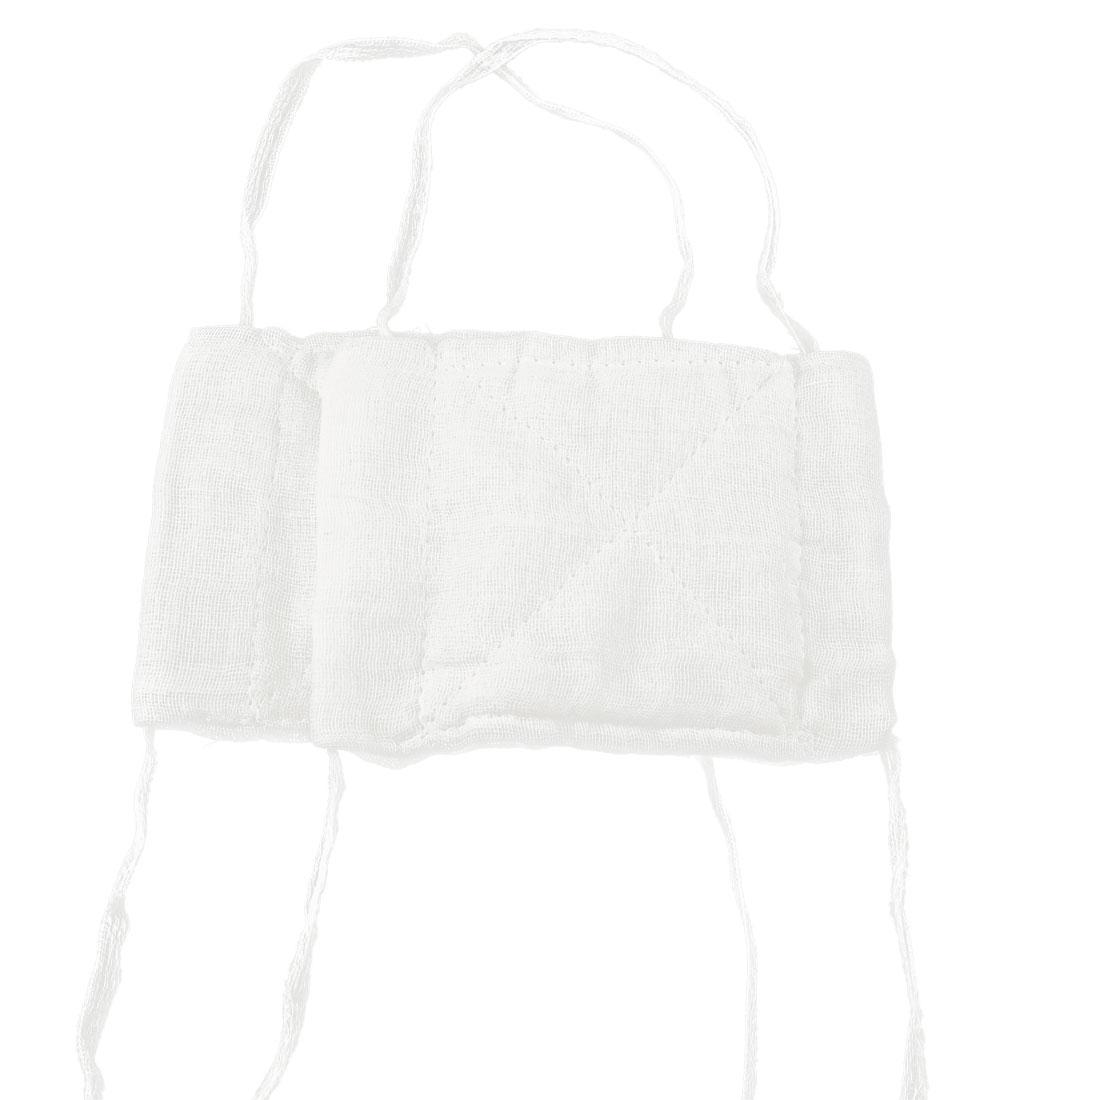 "Home 6.3"" Length Washable White Cotton Gauze Face Mask 2 Pcs"